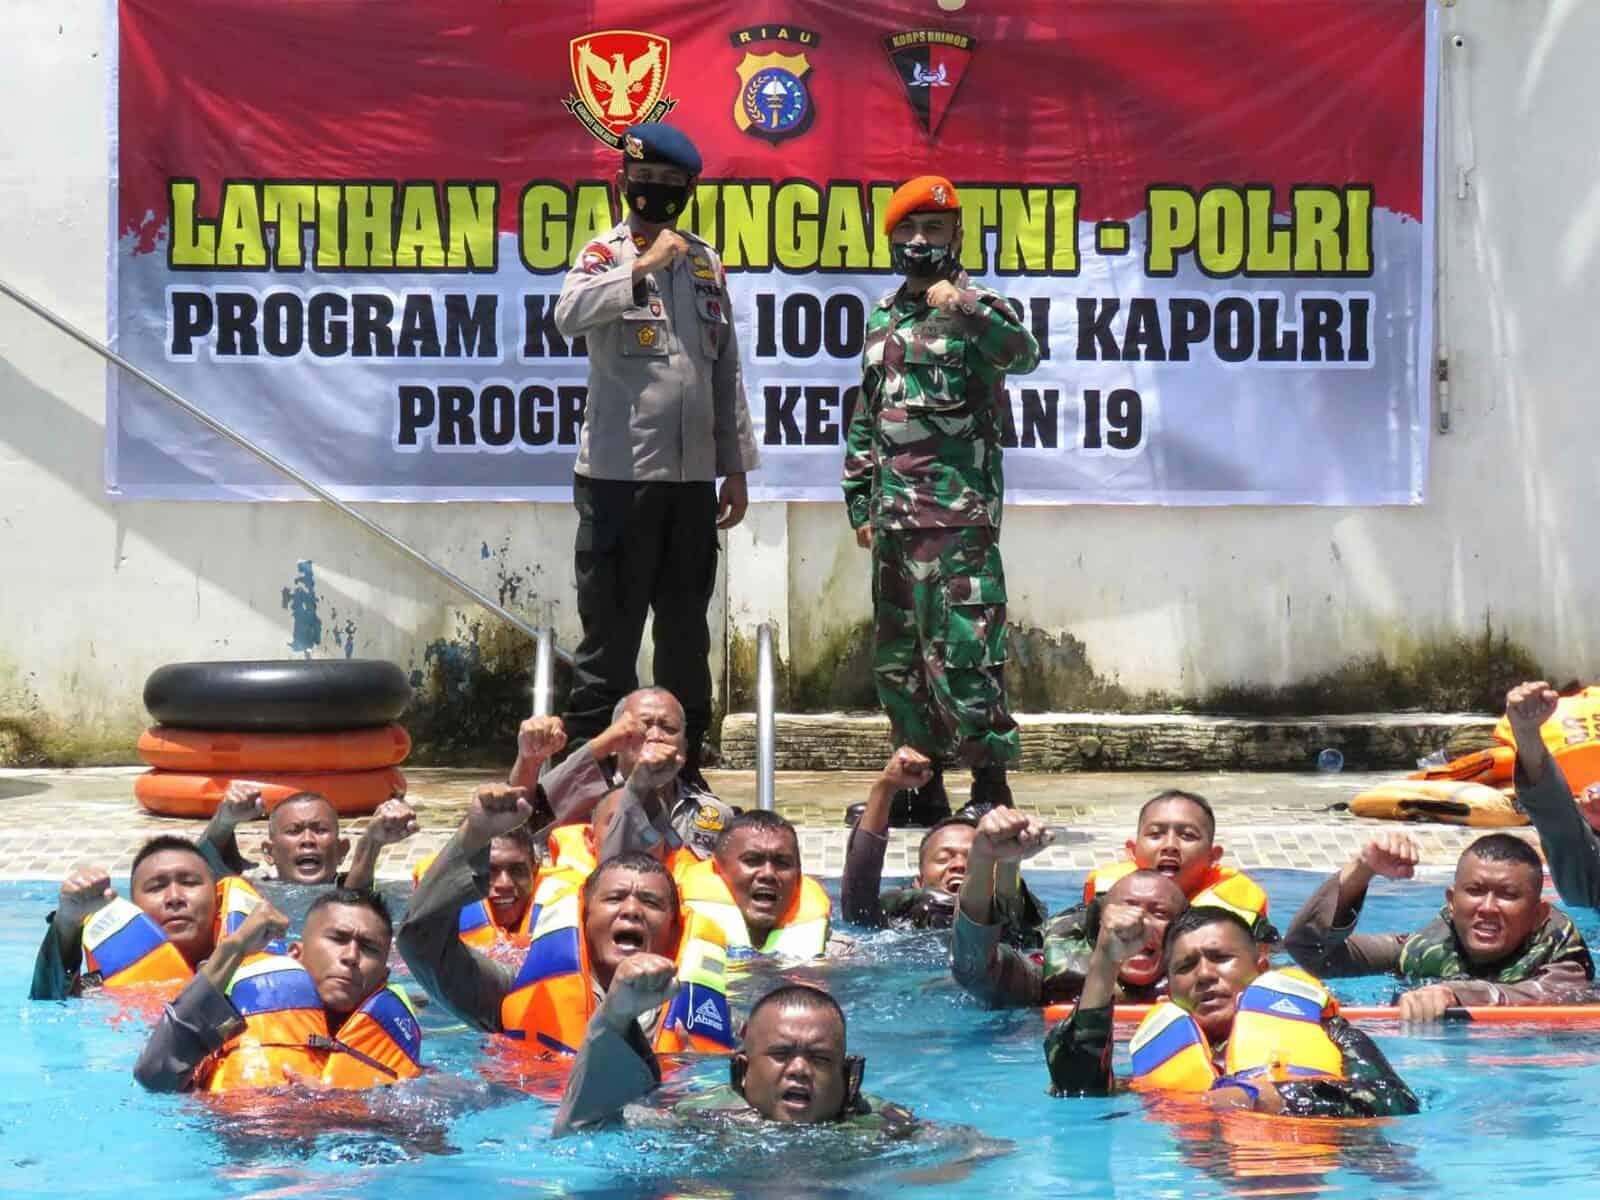 Wujud Sinergitas Tni-Polri, Yonko 462 Paskhas Dan Satbrimobda Polda Riau Melaksanakan Latihan Sar Bersama